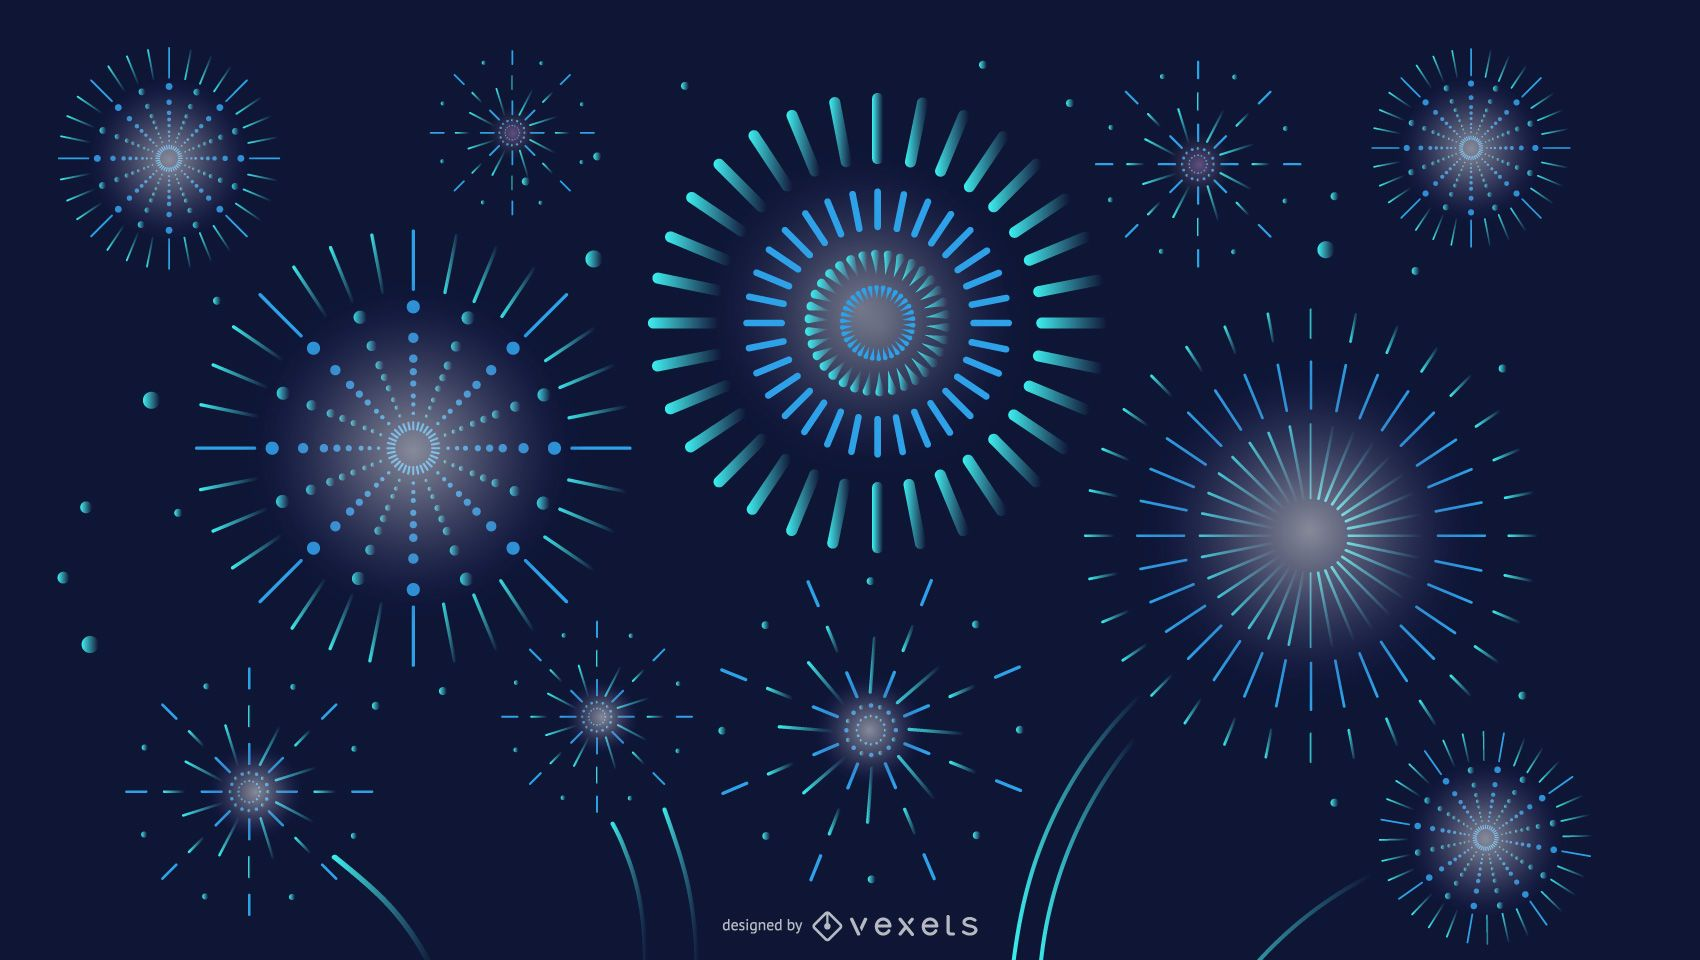 Night Sky Fireworks Background